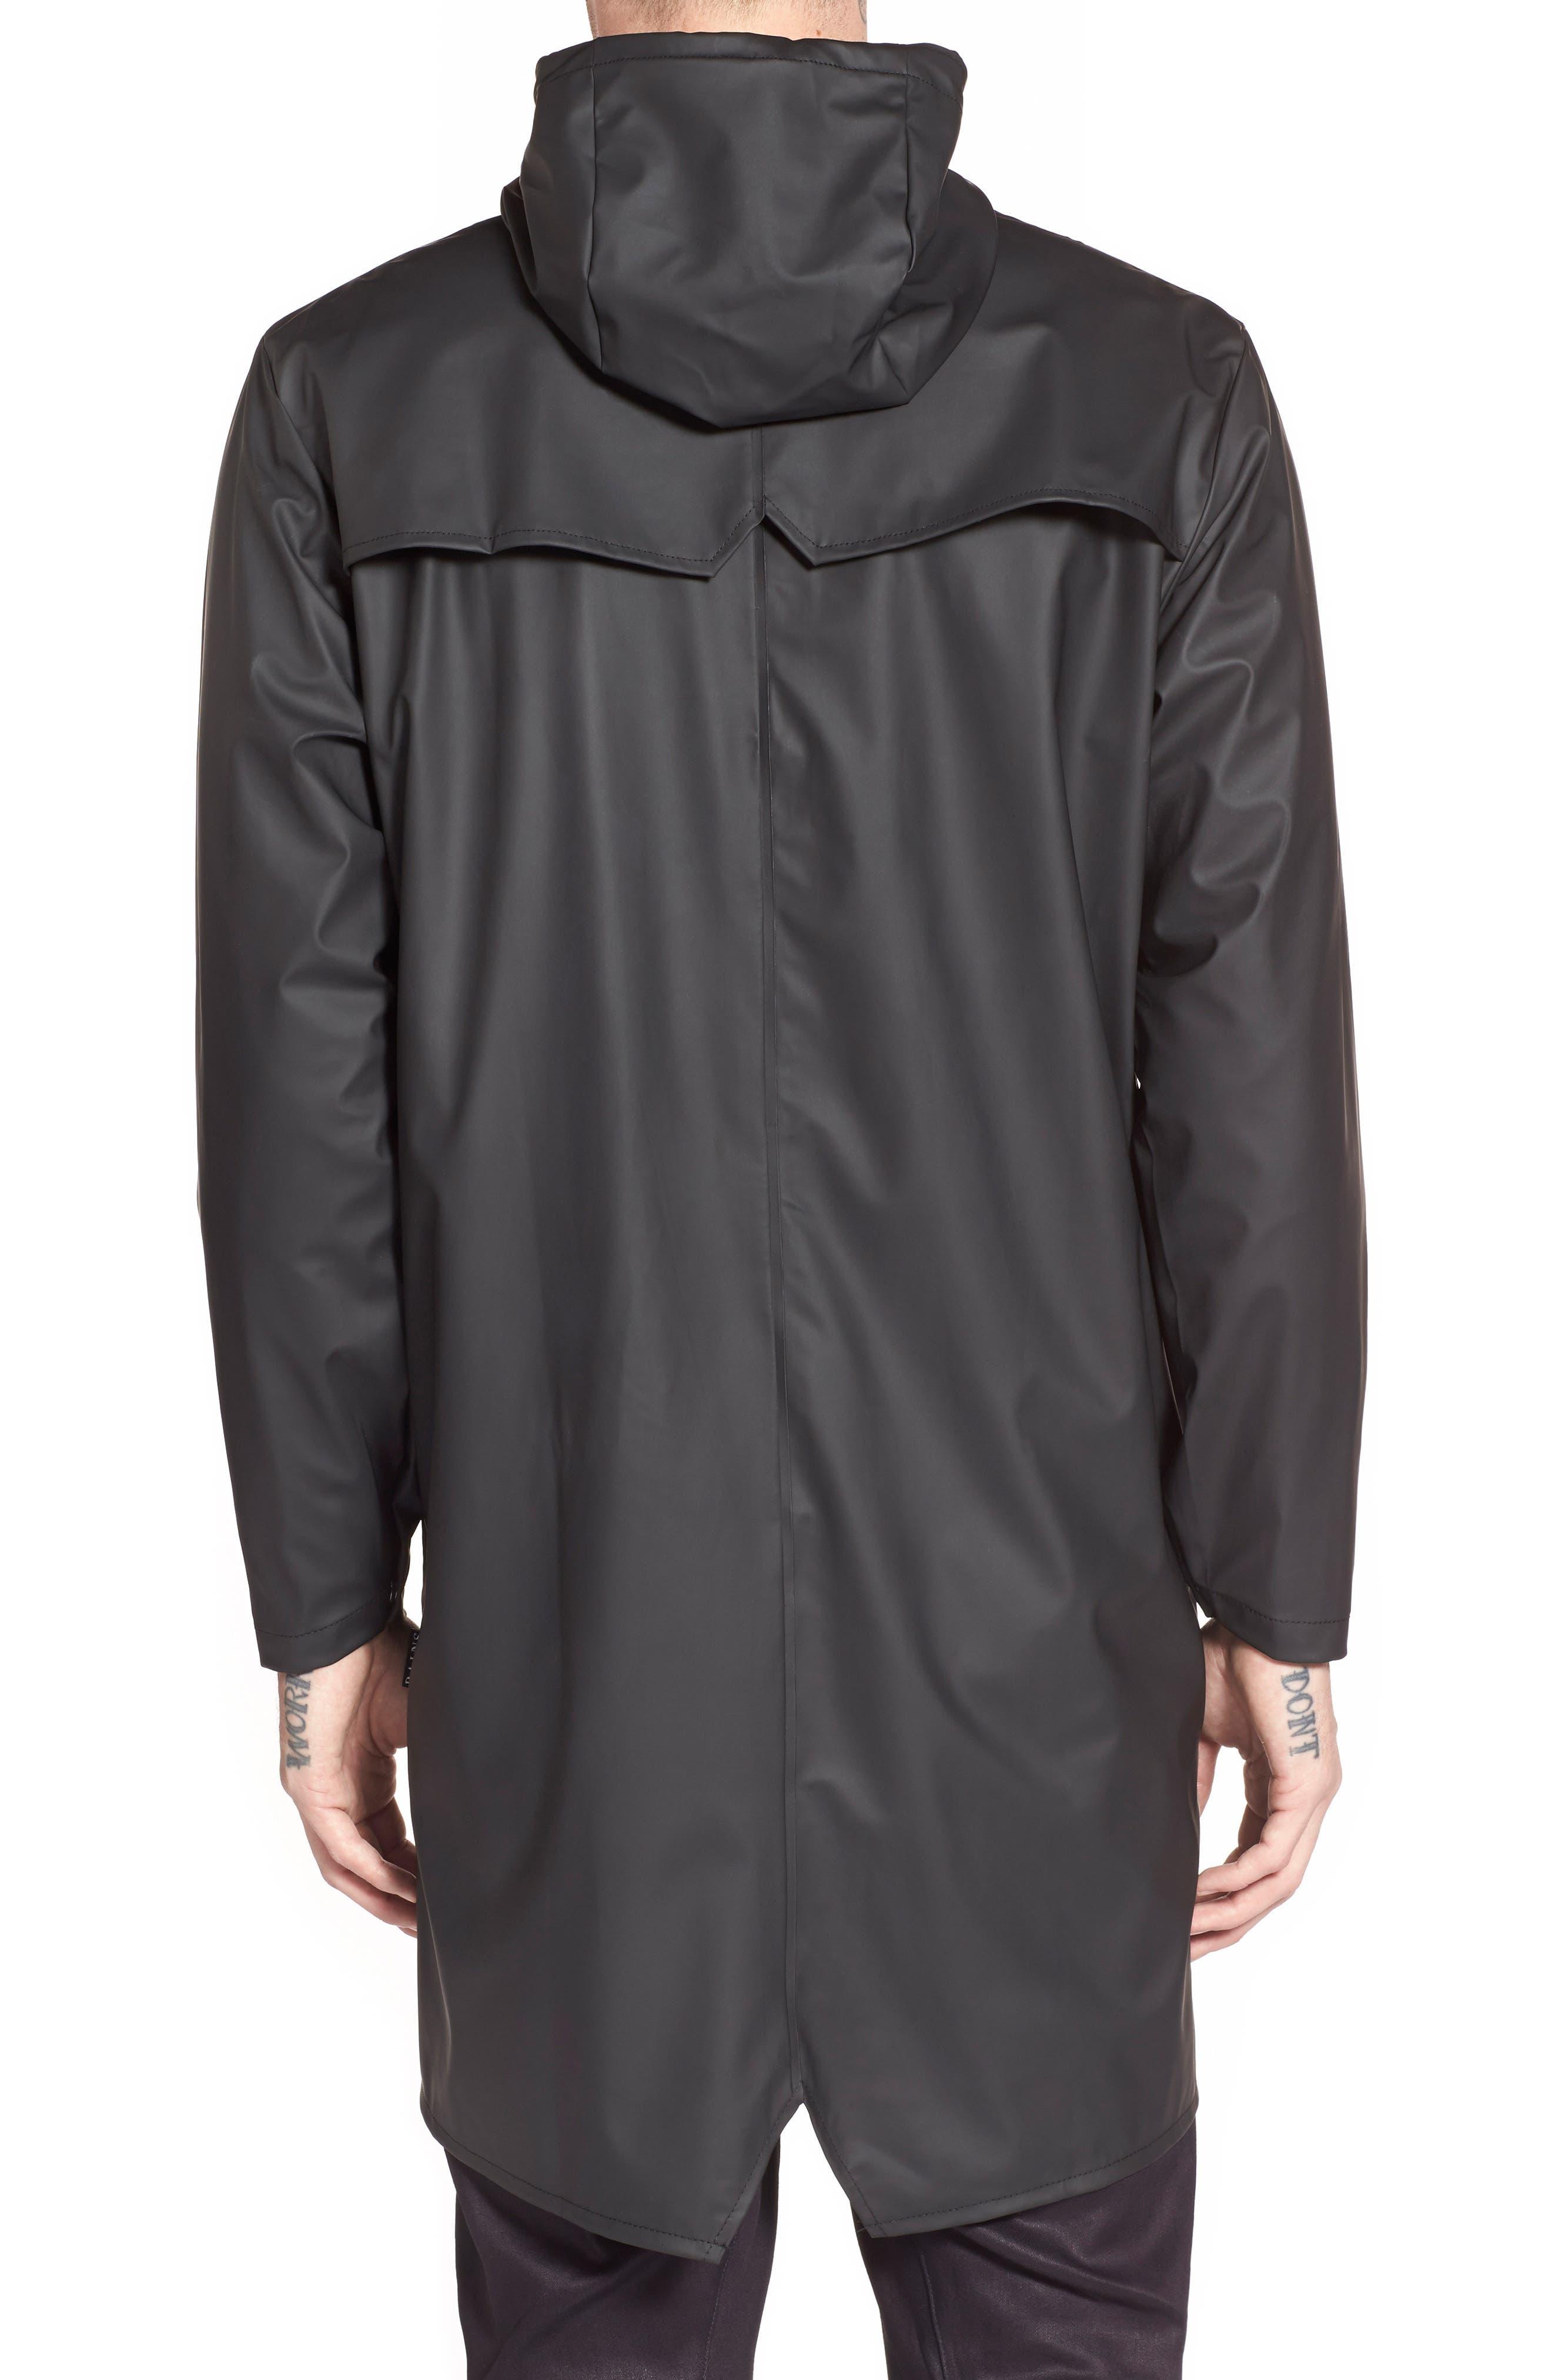 RAINS, Waterproof Hooded Long Rain Jacket, Alternate thumbnail 2, color, BLACK